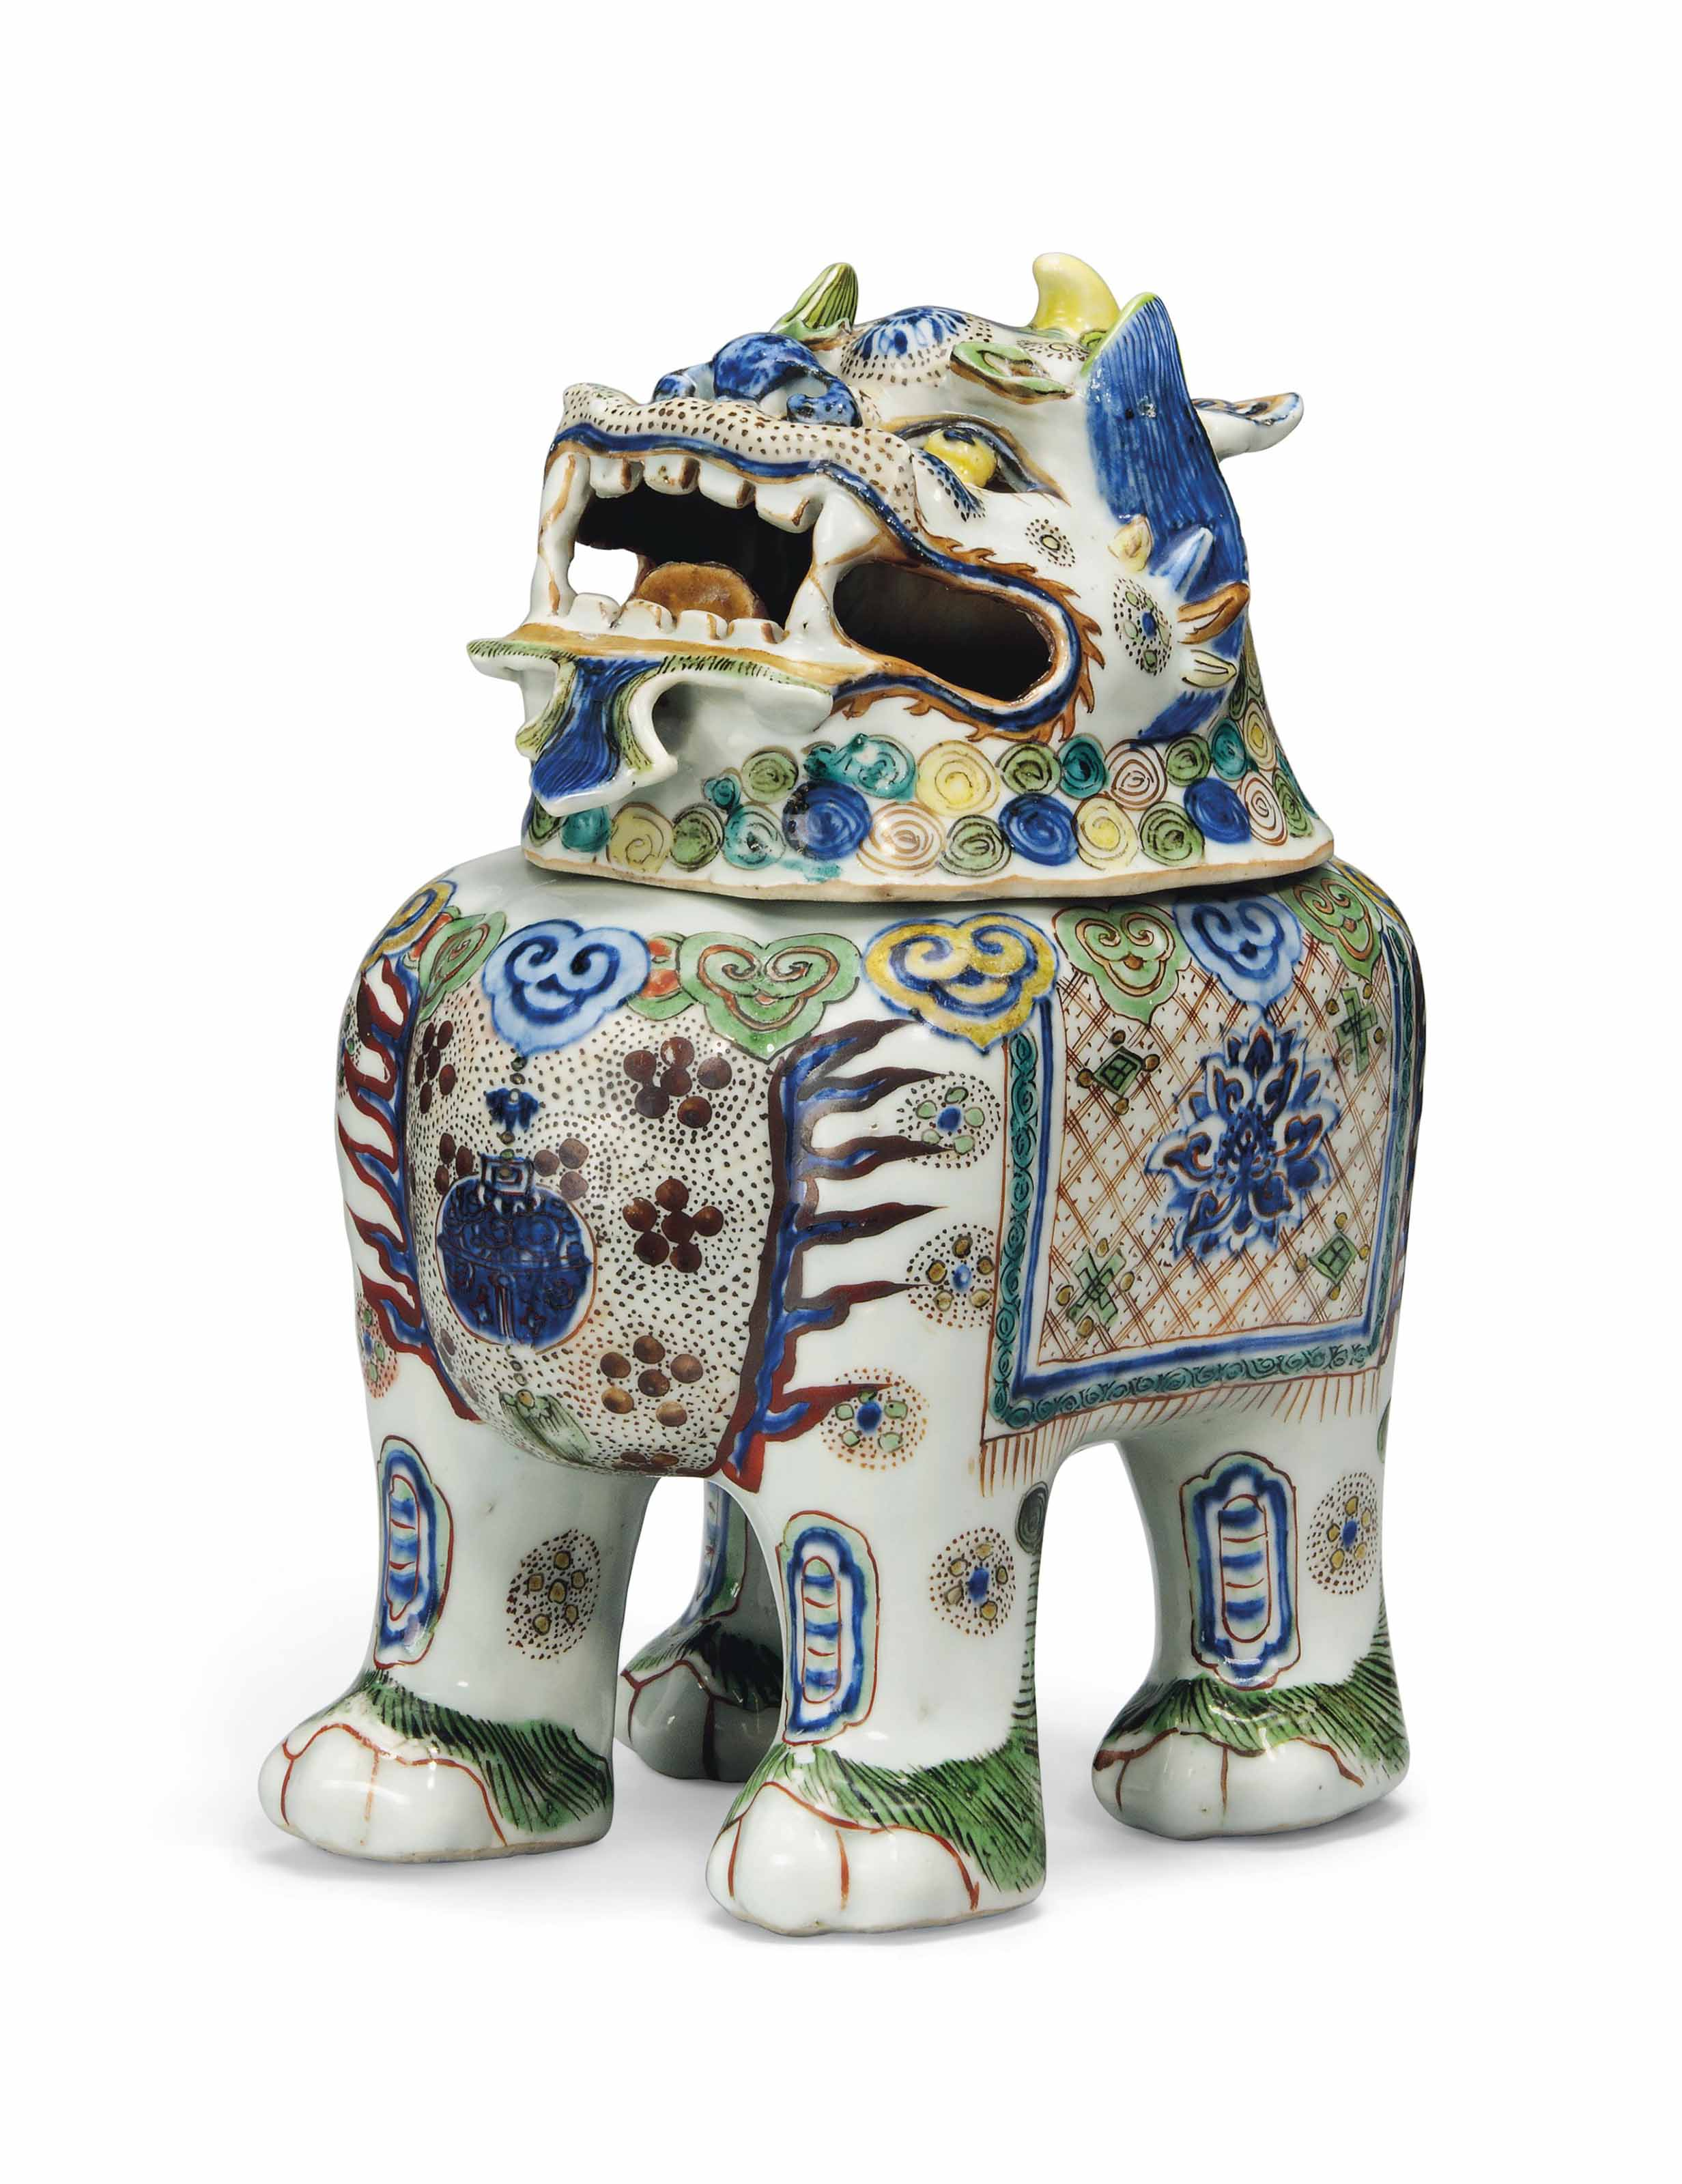 A WUCAI 'BUDDHIST LION' CENSER